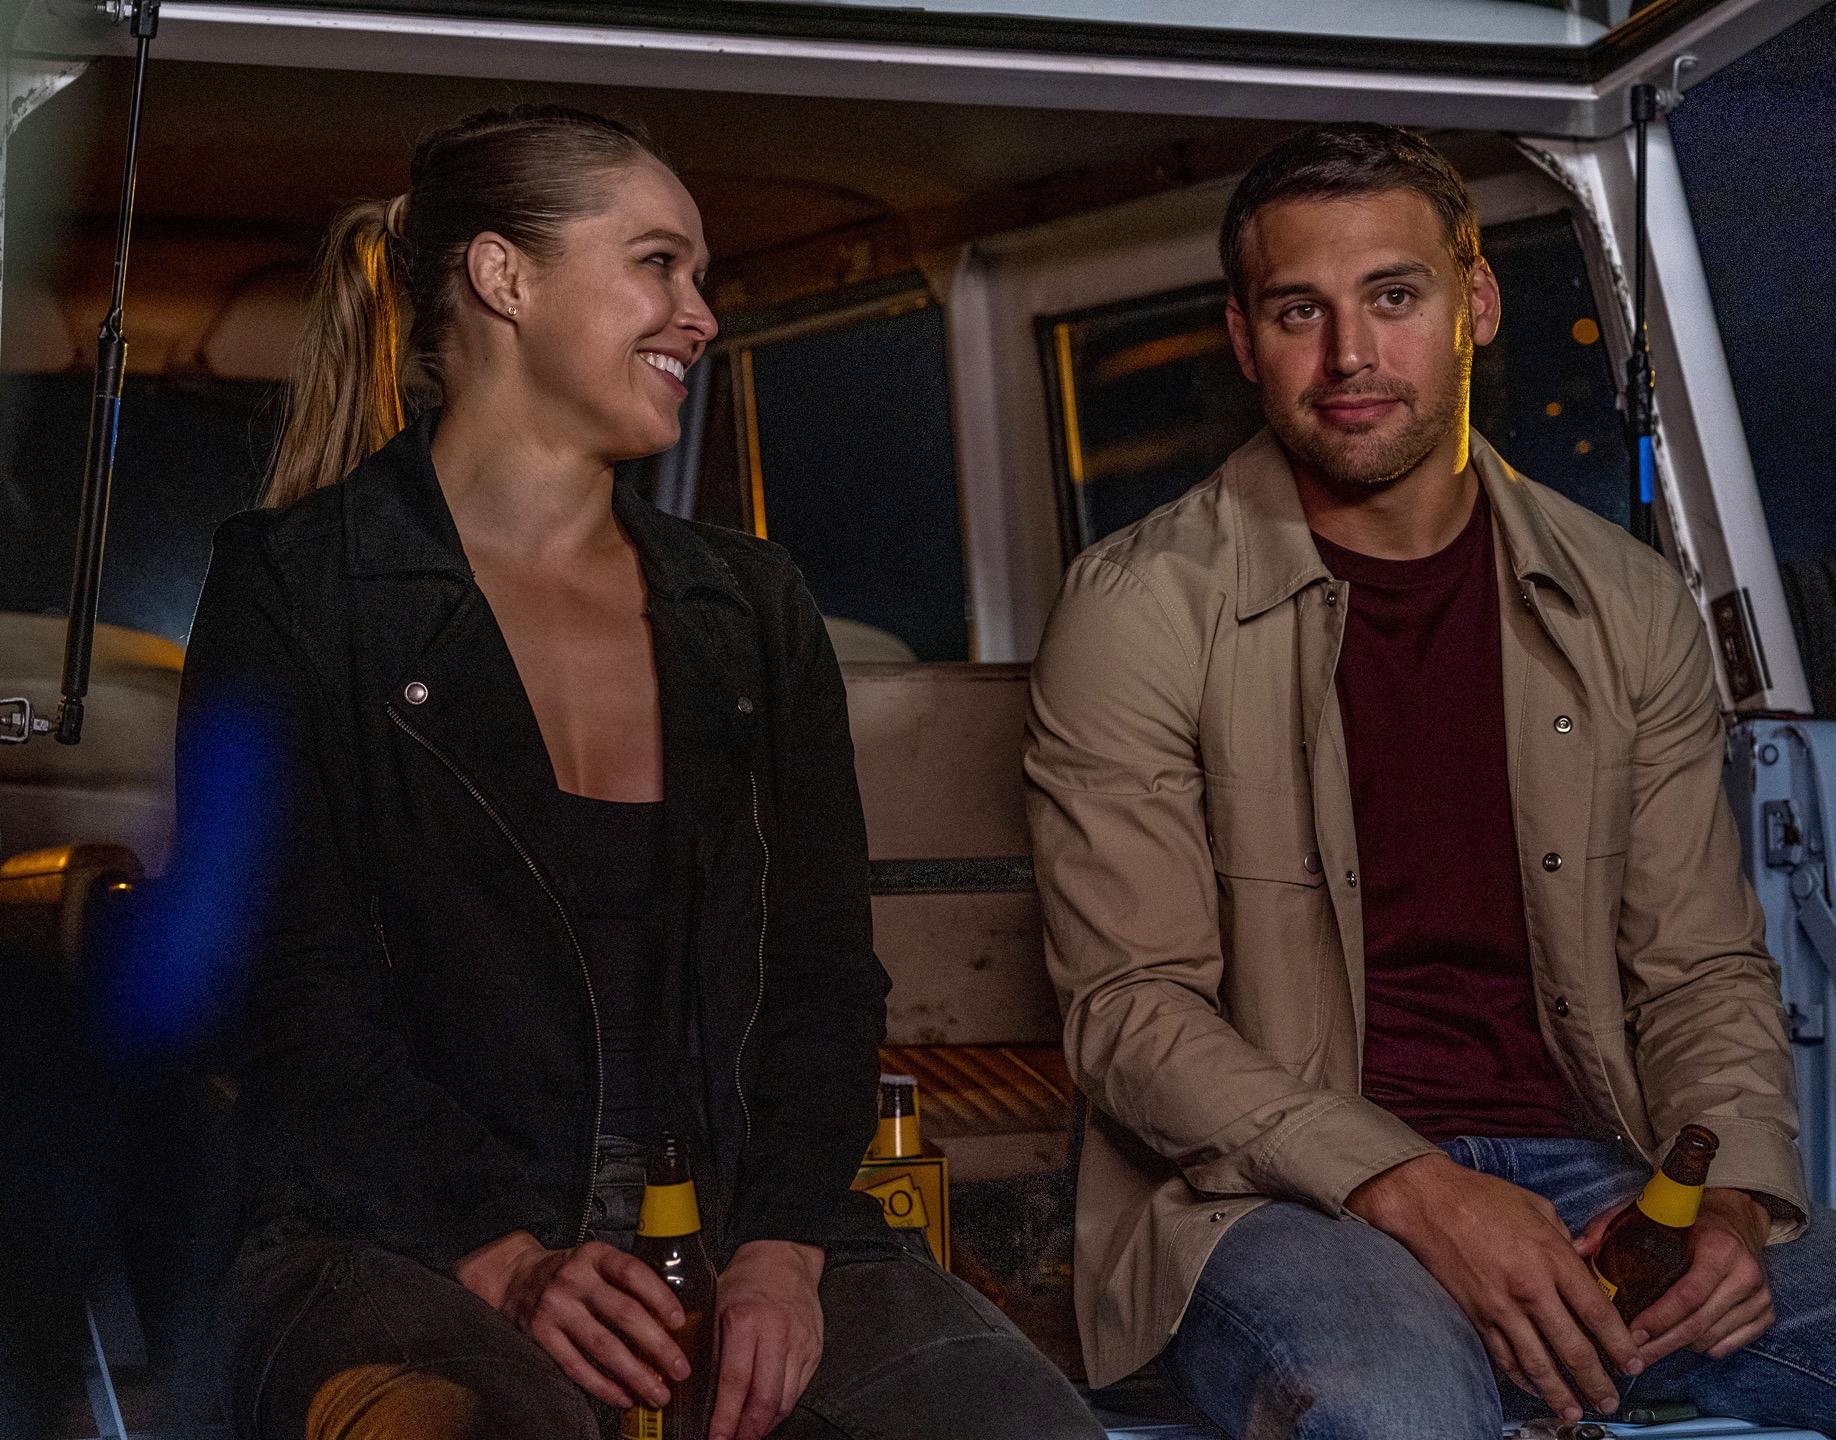 "9-1-1: L-R: Guest star Ronda Rousey and Ryan Guzman in the ""Rage"" episode of 9-1-1 airing Monday, Oct. 21 (8:00-9:01 PM ET/PT) on FOX. © 2019 FOX MEDIA LLC. CR: Jack Zeman/FOX."